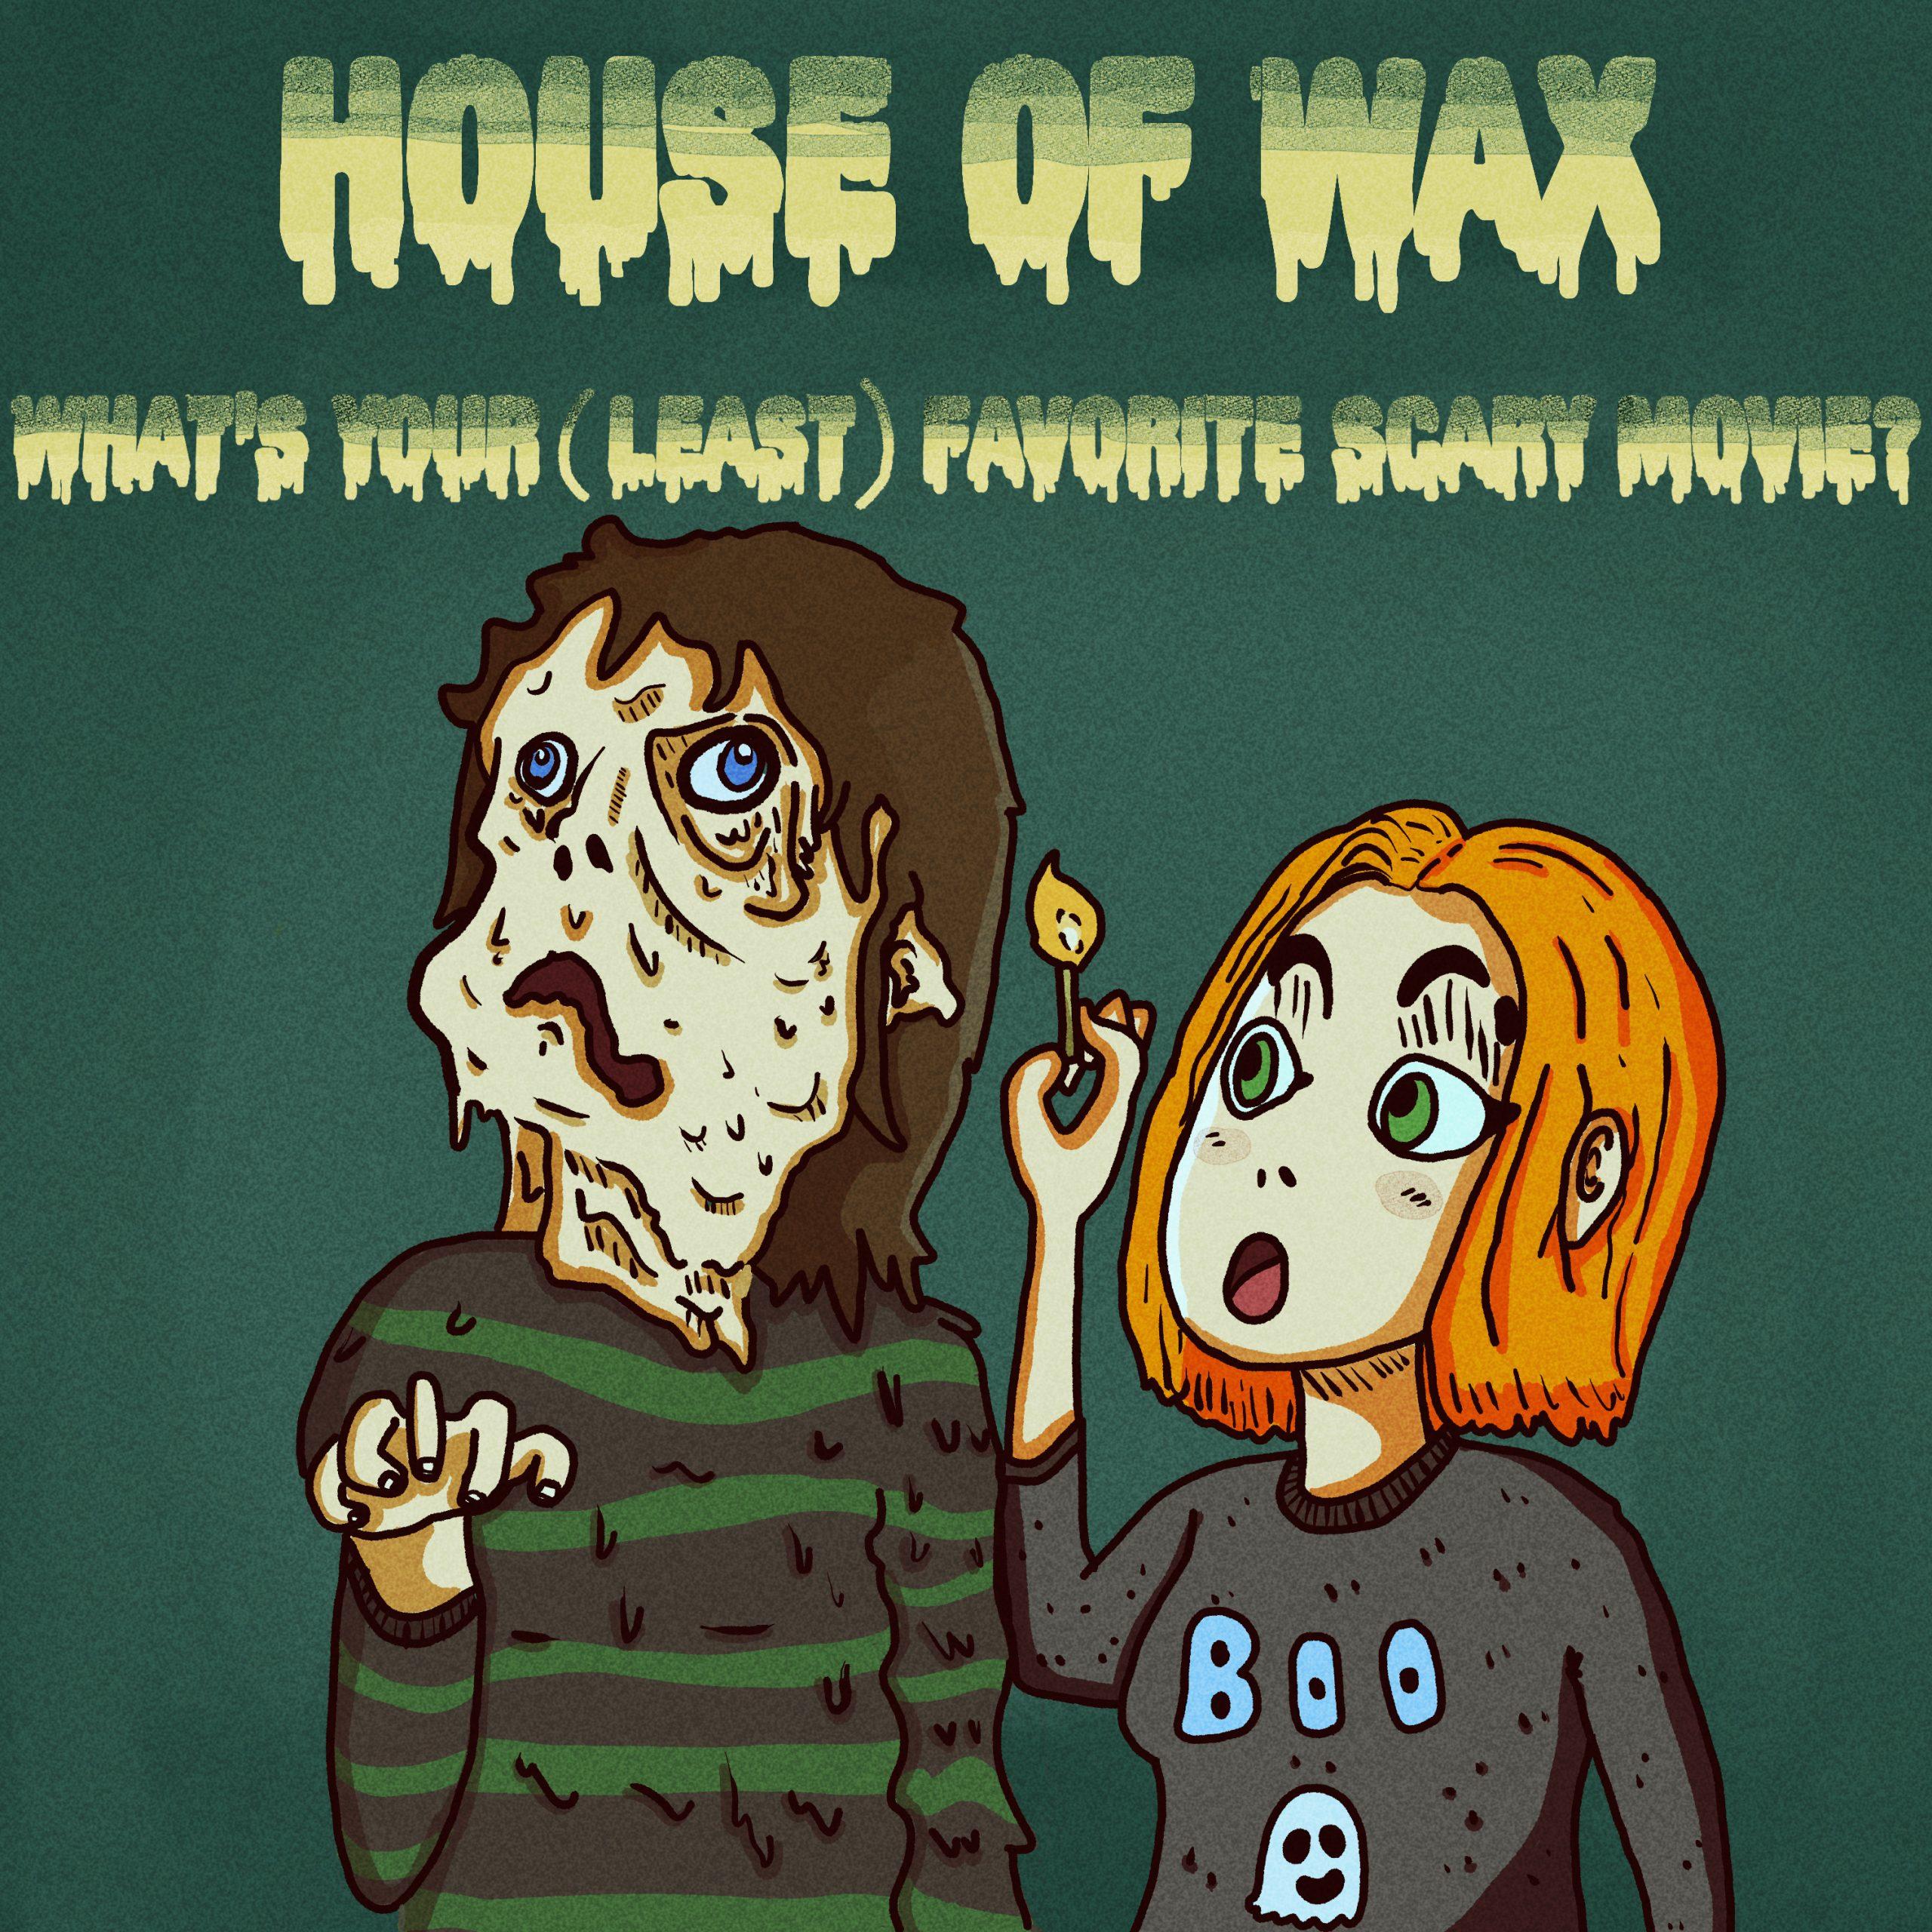 #40: House of Wax (2005)